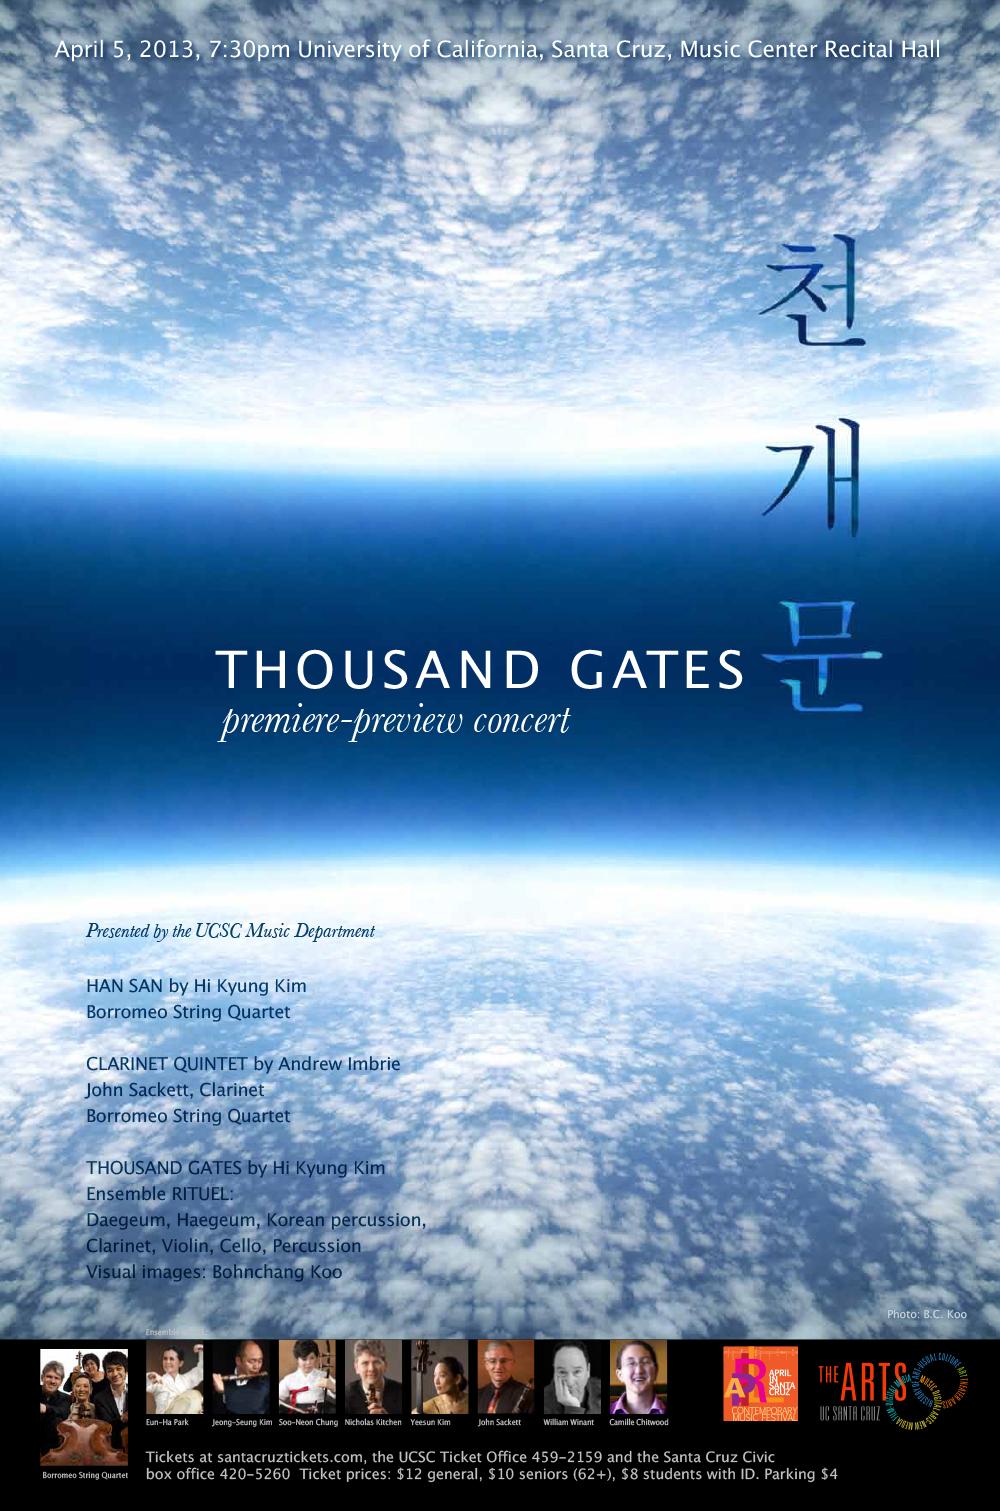 Thousand Gates concert poster